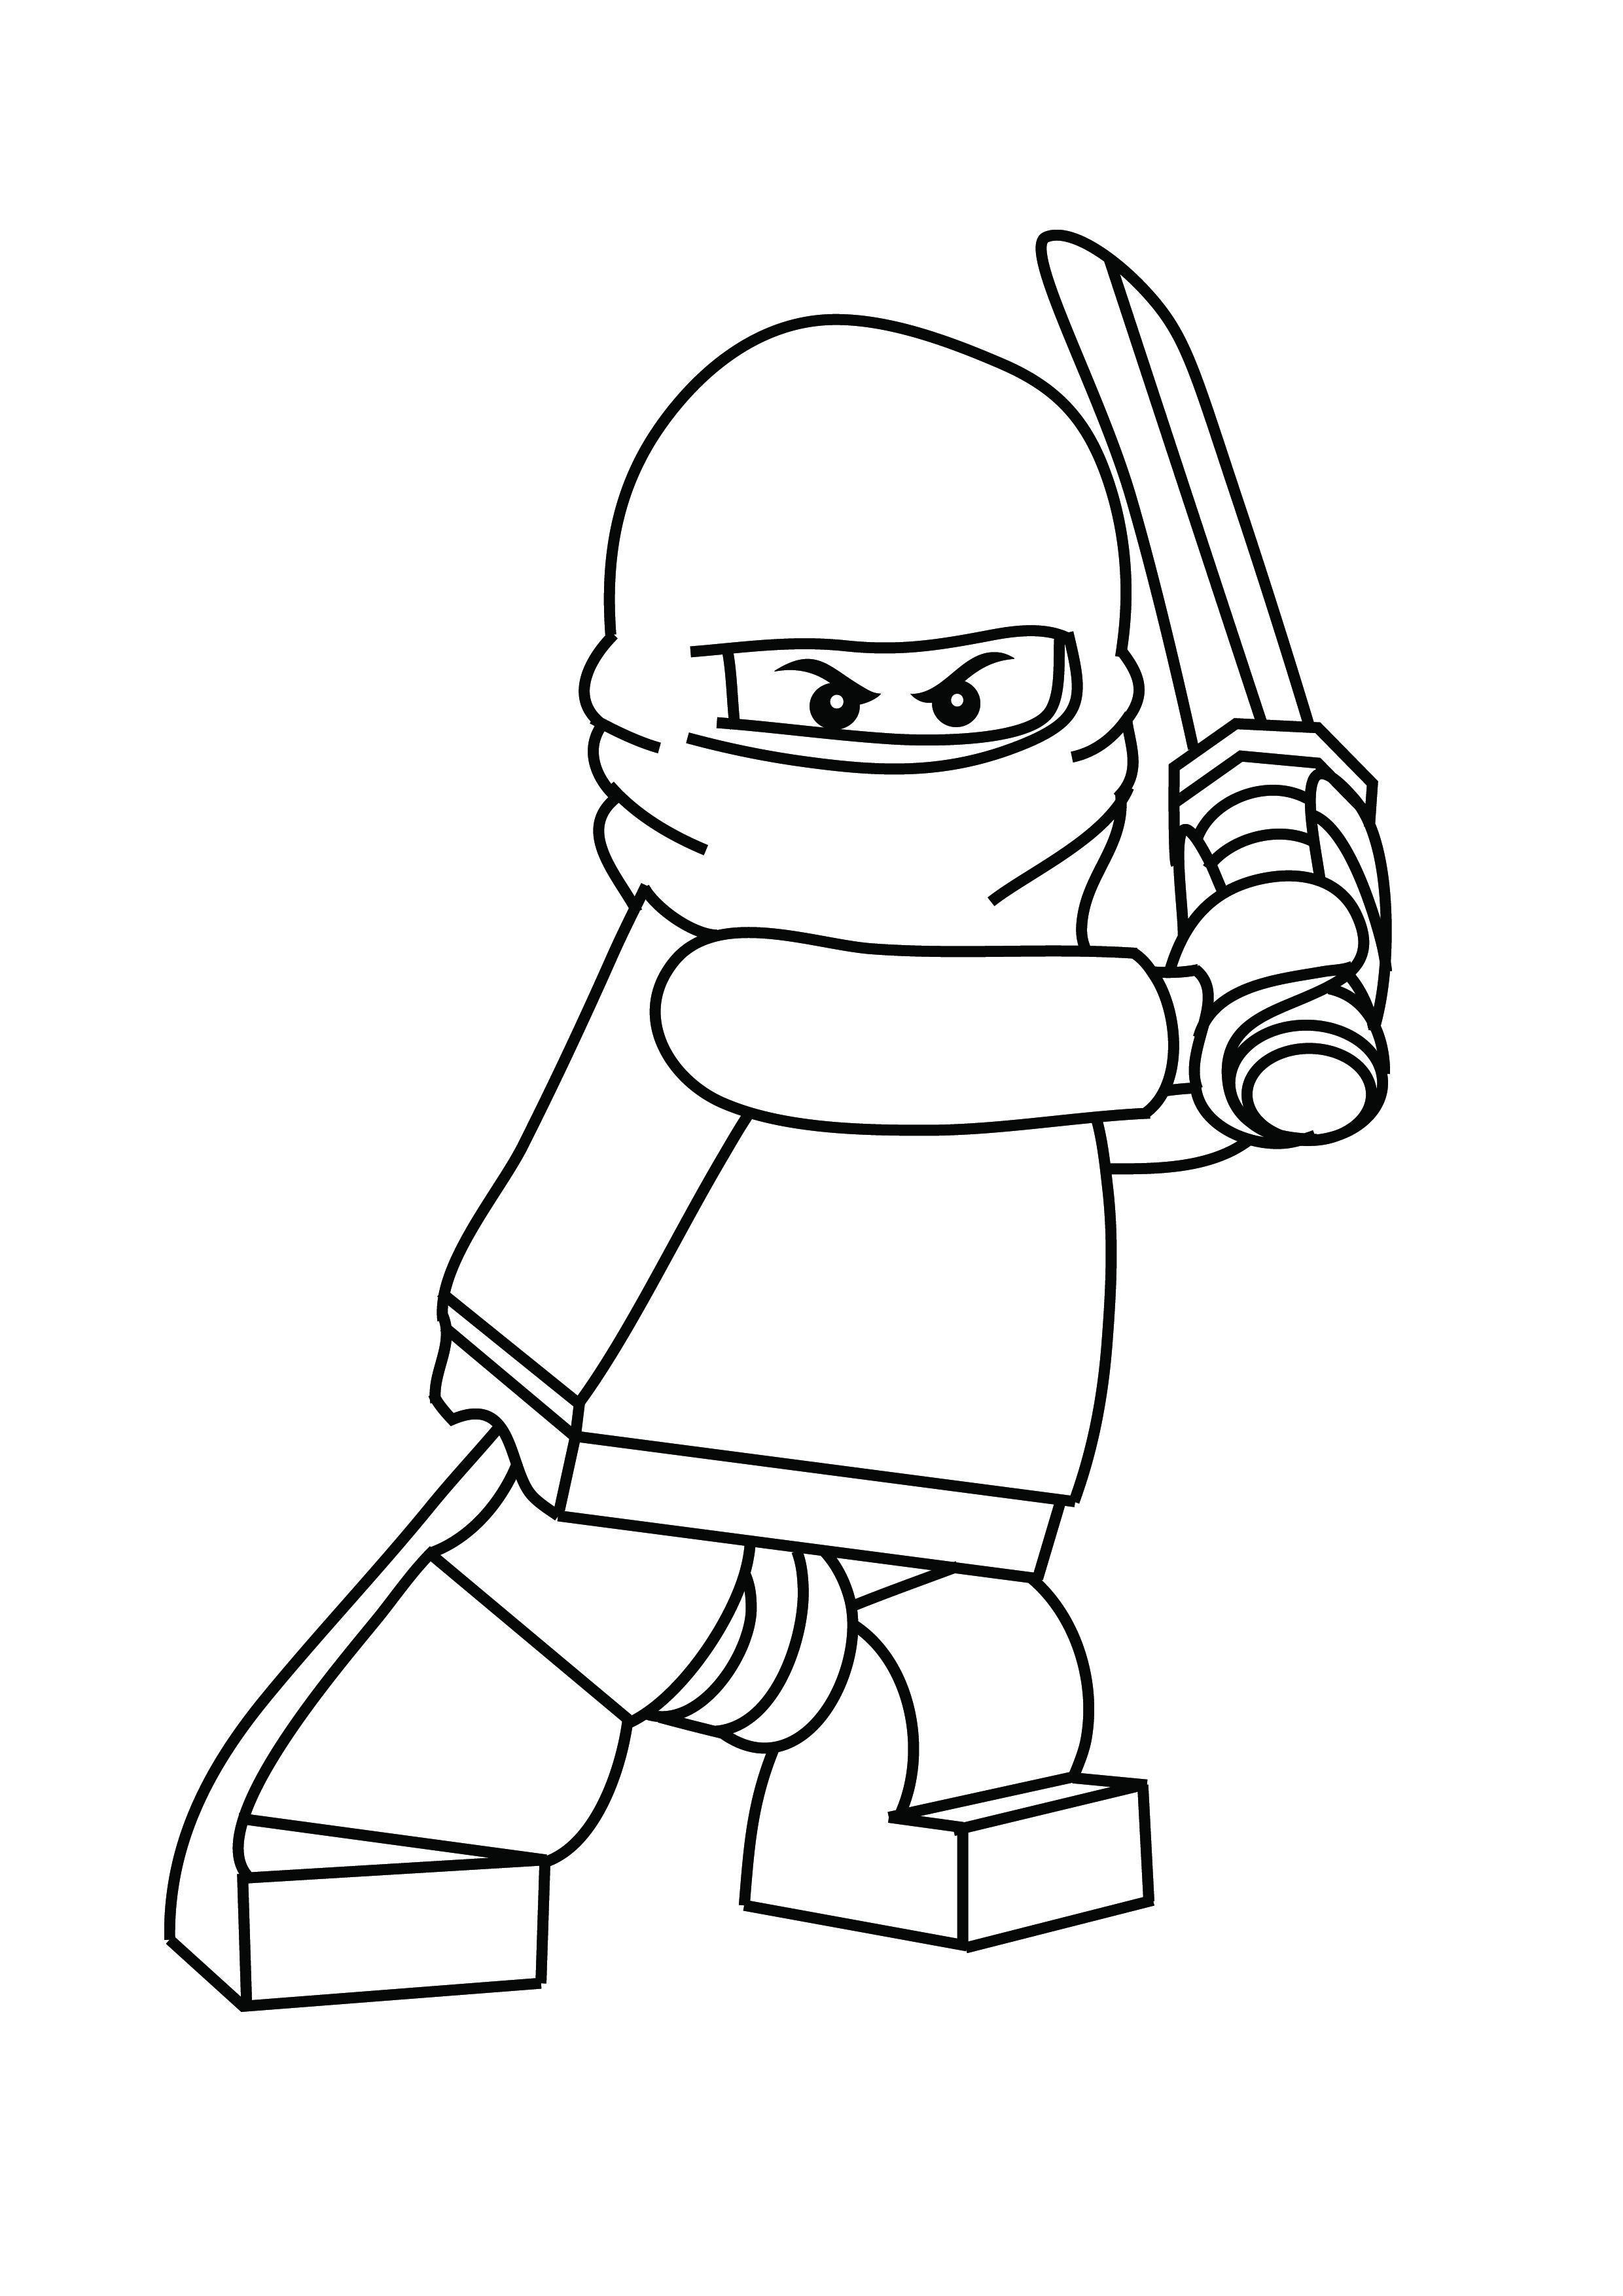 Ninjago Lego Coloring Pages